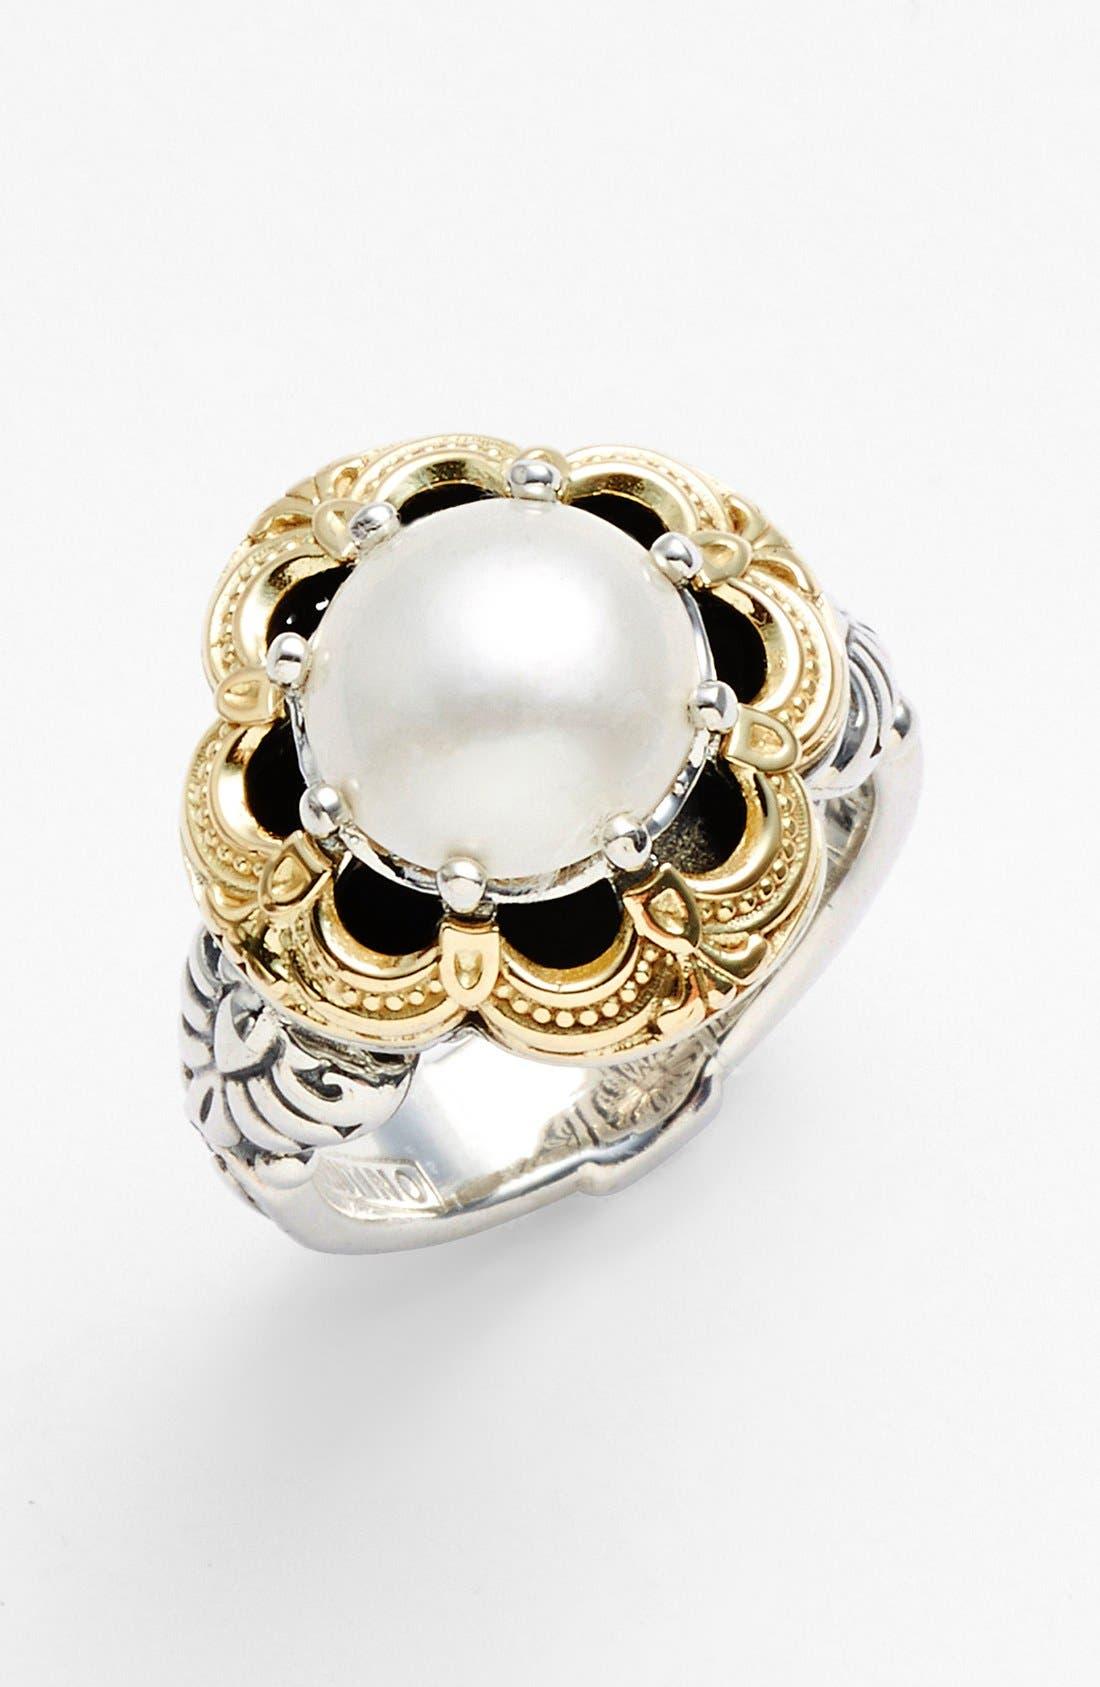 'Hermione' Semiprecious Stone Ring,                         Main,                         color, Silver/ Gold